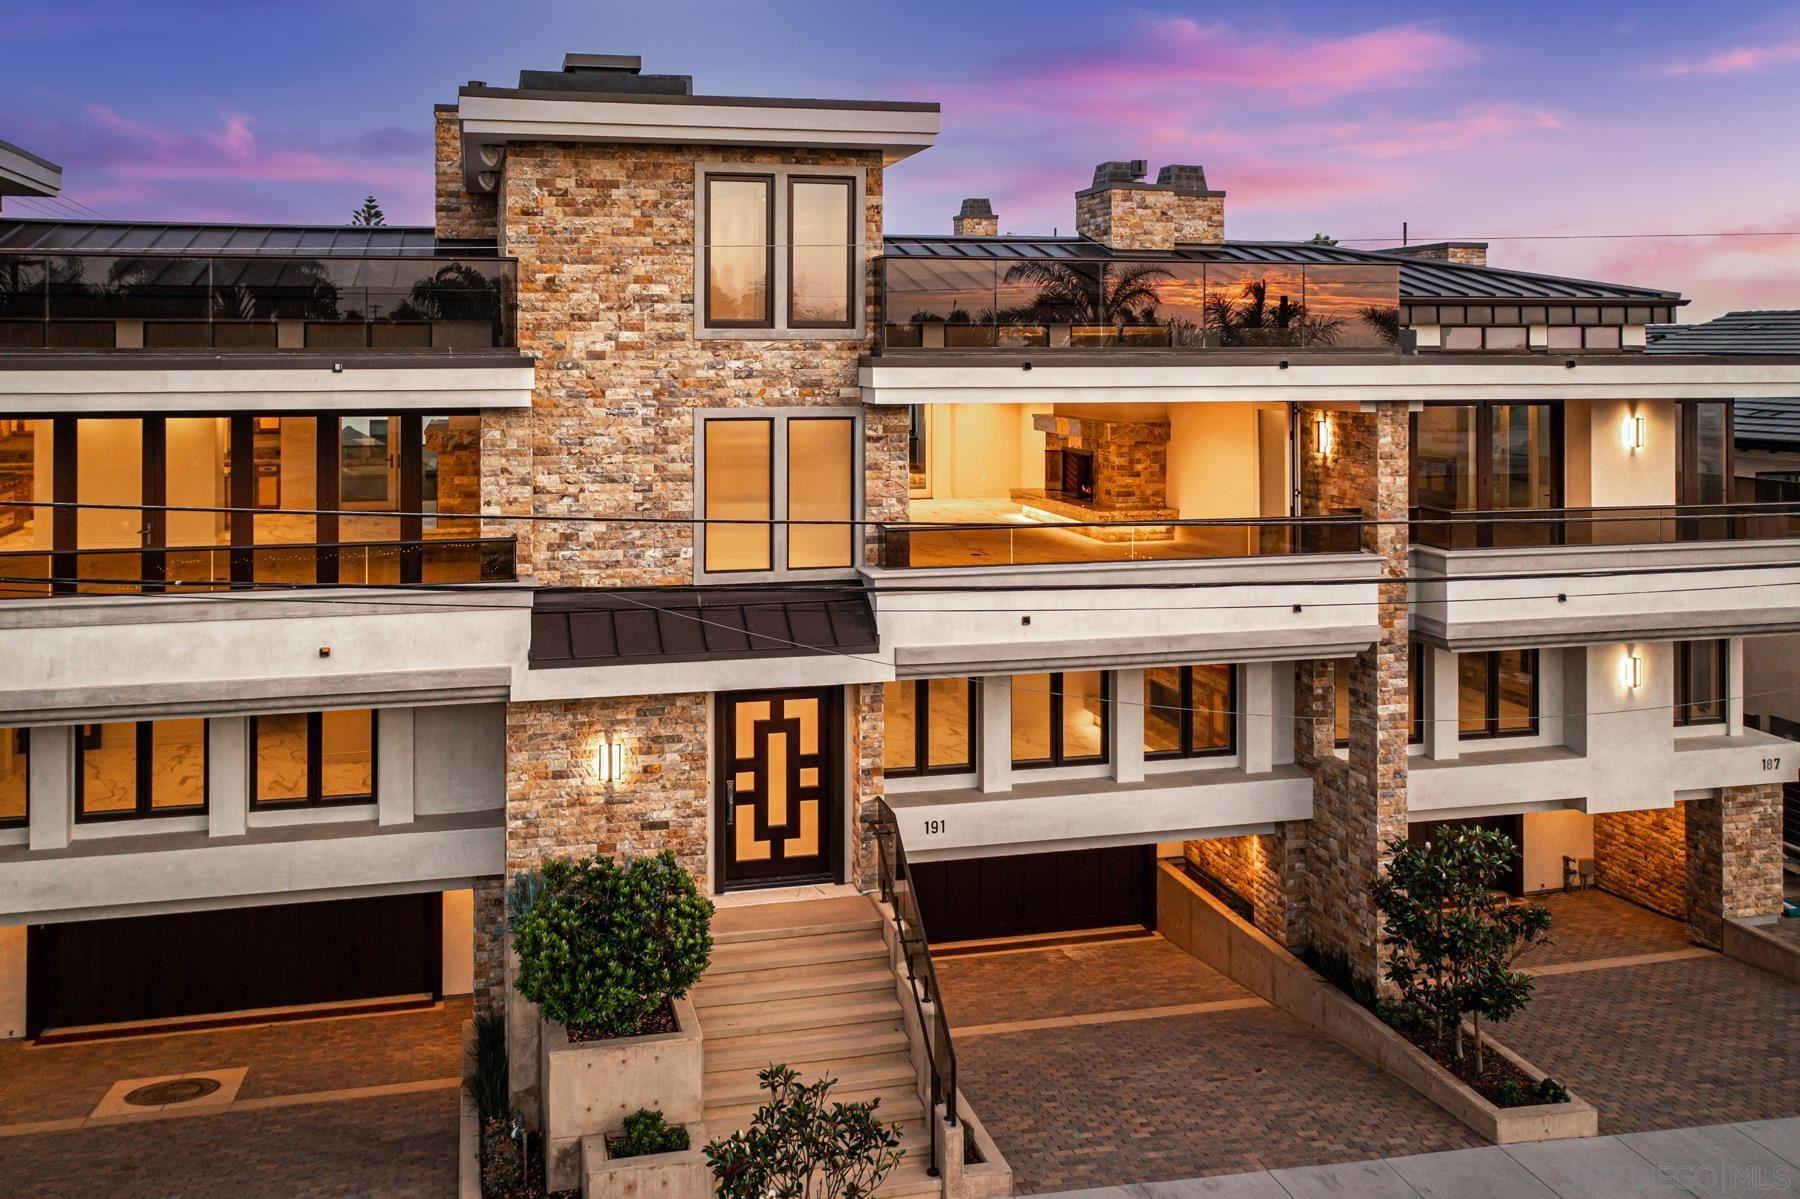 191 Cherry Ave                                                                               Carlsbad                                                                      , CA - $4,395,000